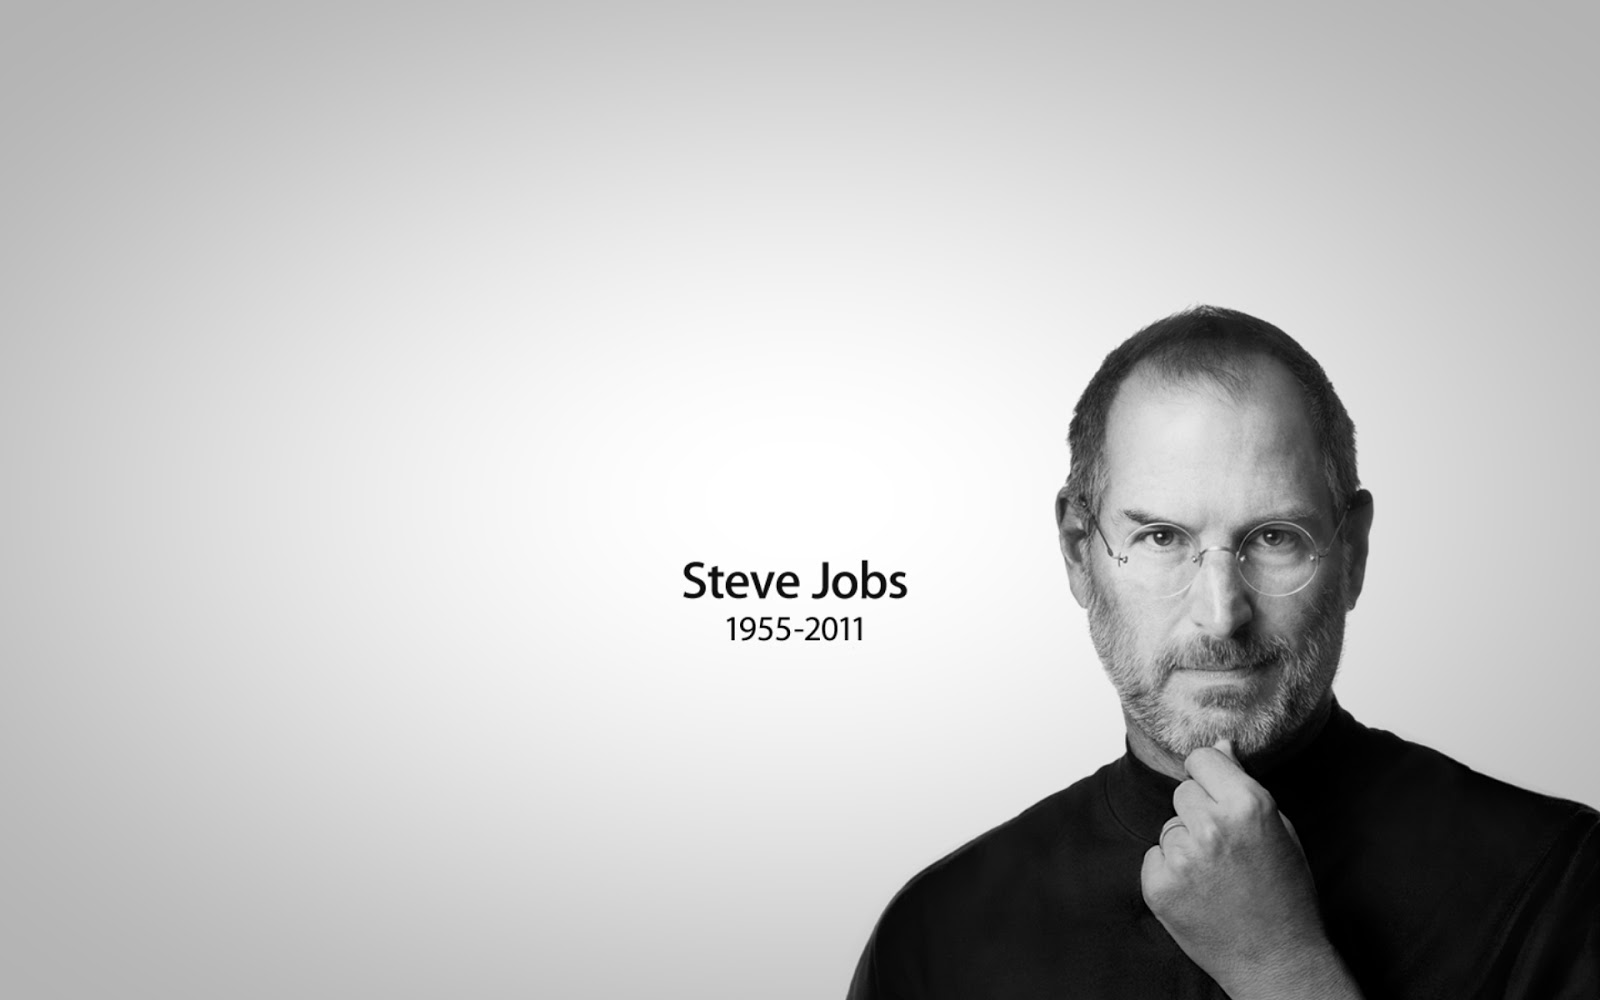 http://4.bp.blogspot.com/-l3-vd0aCjsk/TqkTp2YFQ_I/AAAAAAAADYw/5jNgNaF422c/s1600/Steve+Jobs+Wallpapers.jpg